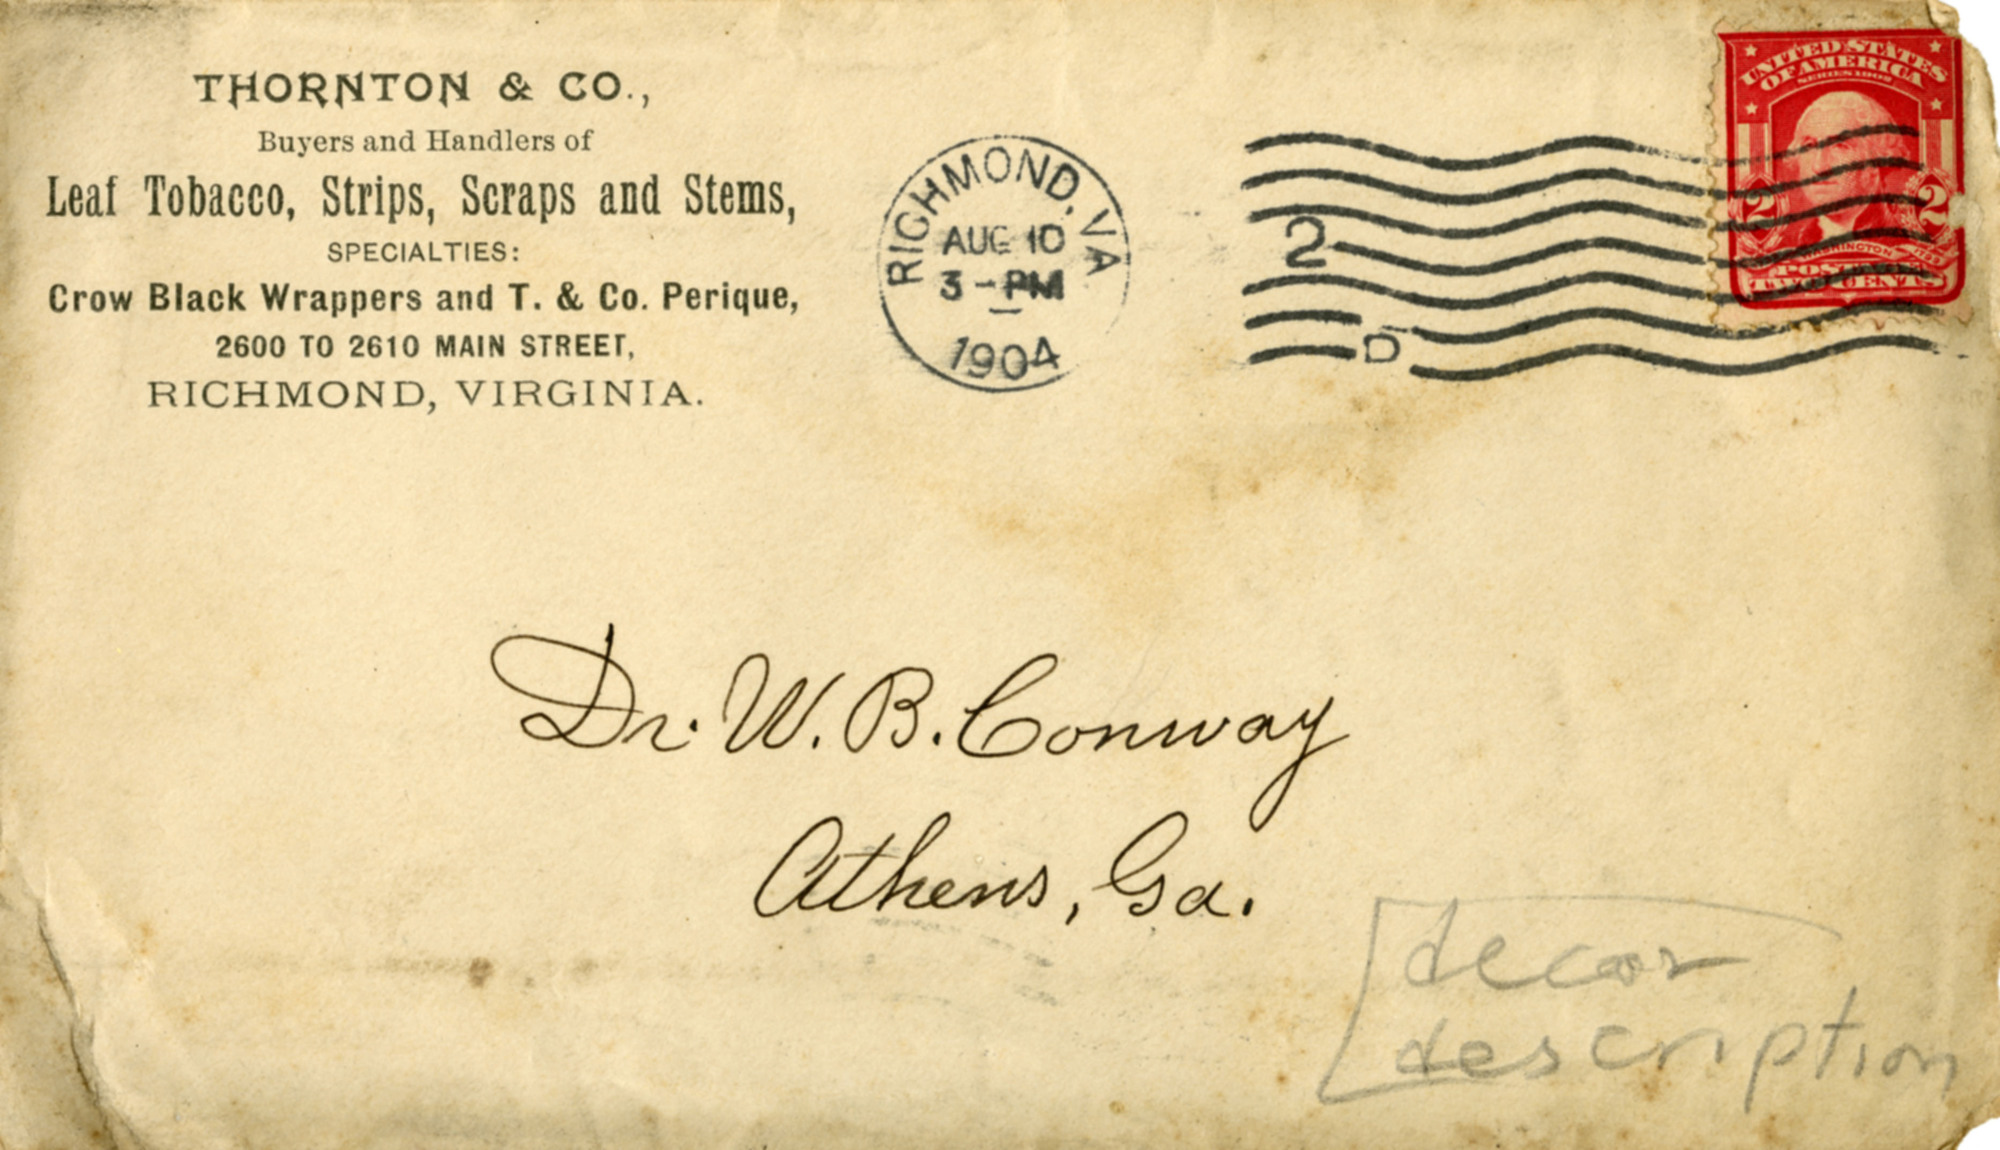 http://spec.lib.vt.edu/pickup/Omeka_upload/Ms2012-039_ConwayCatlett_F5_Letter_1904_0810_enva.jpg